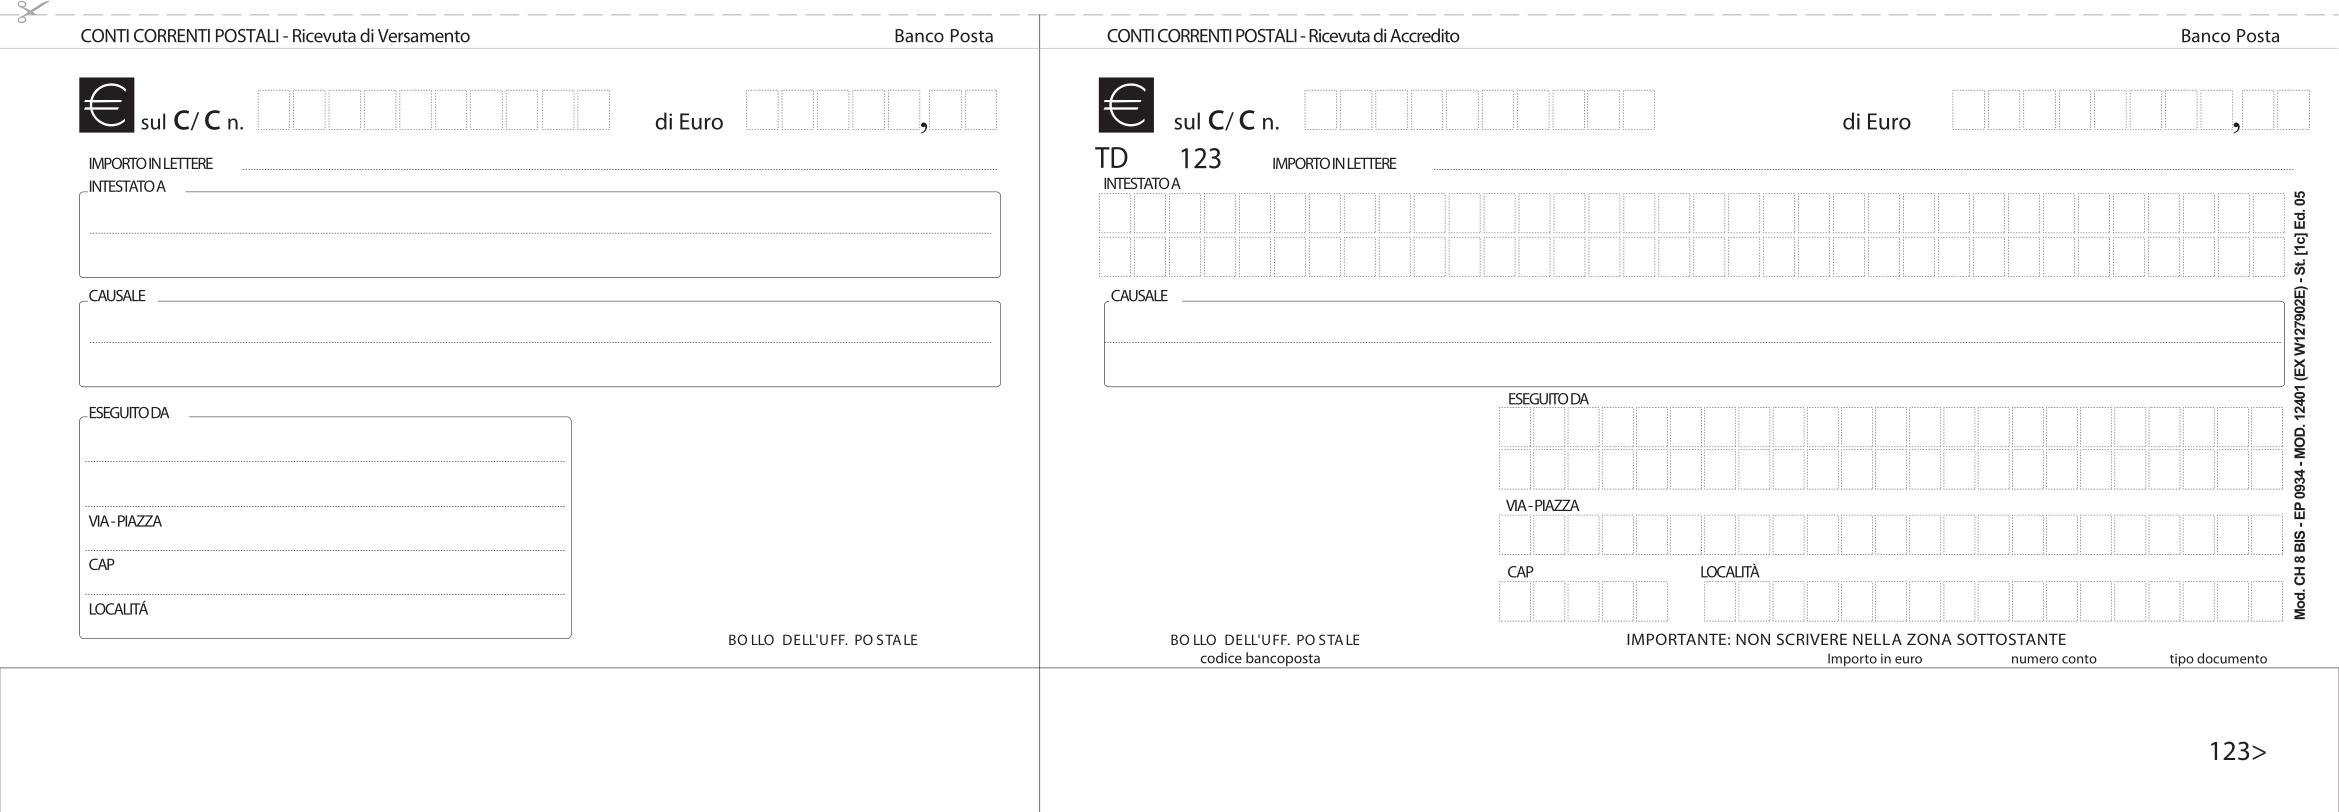 Postal payment slip